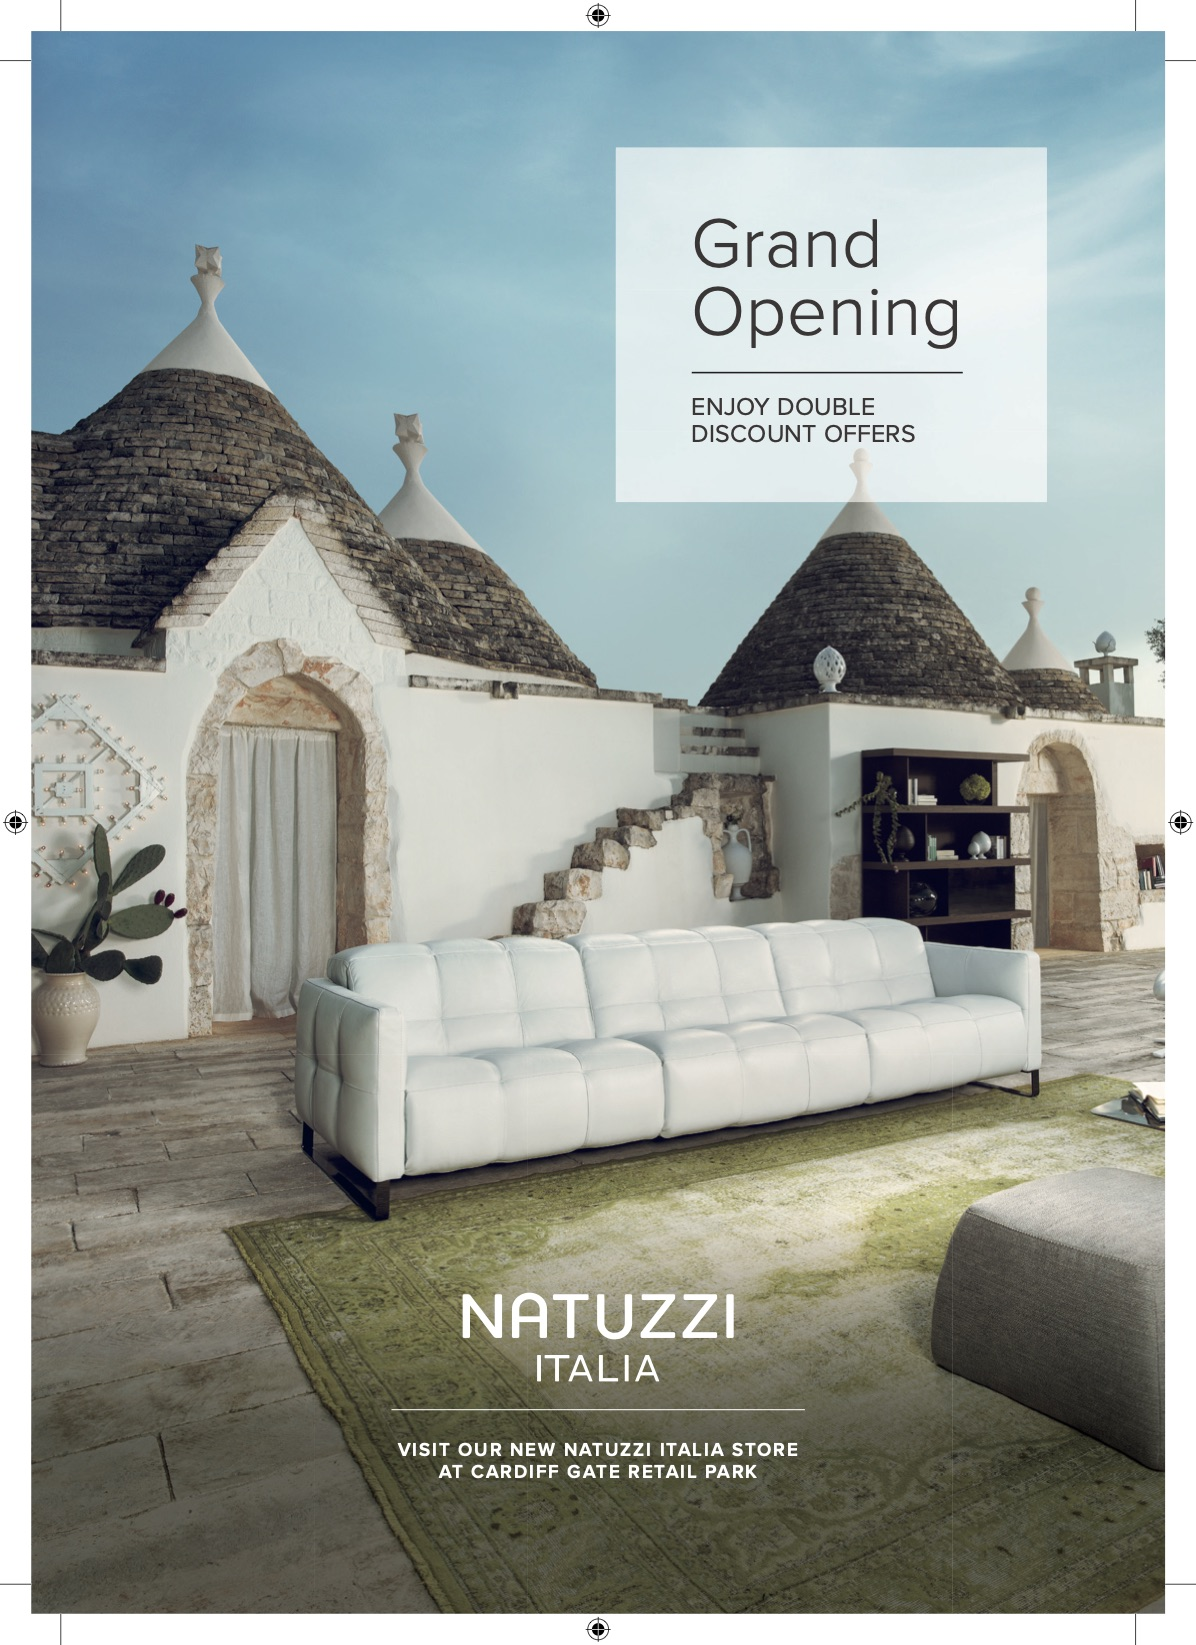 NI - Grand opening double discount - boo